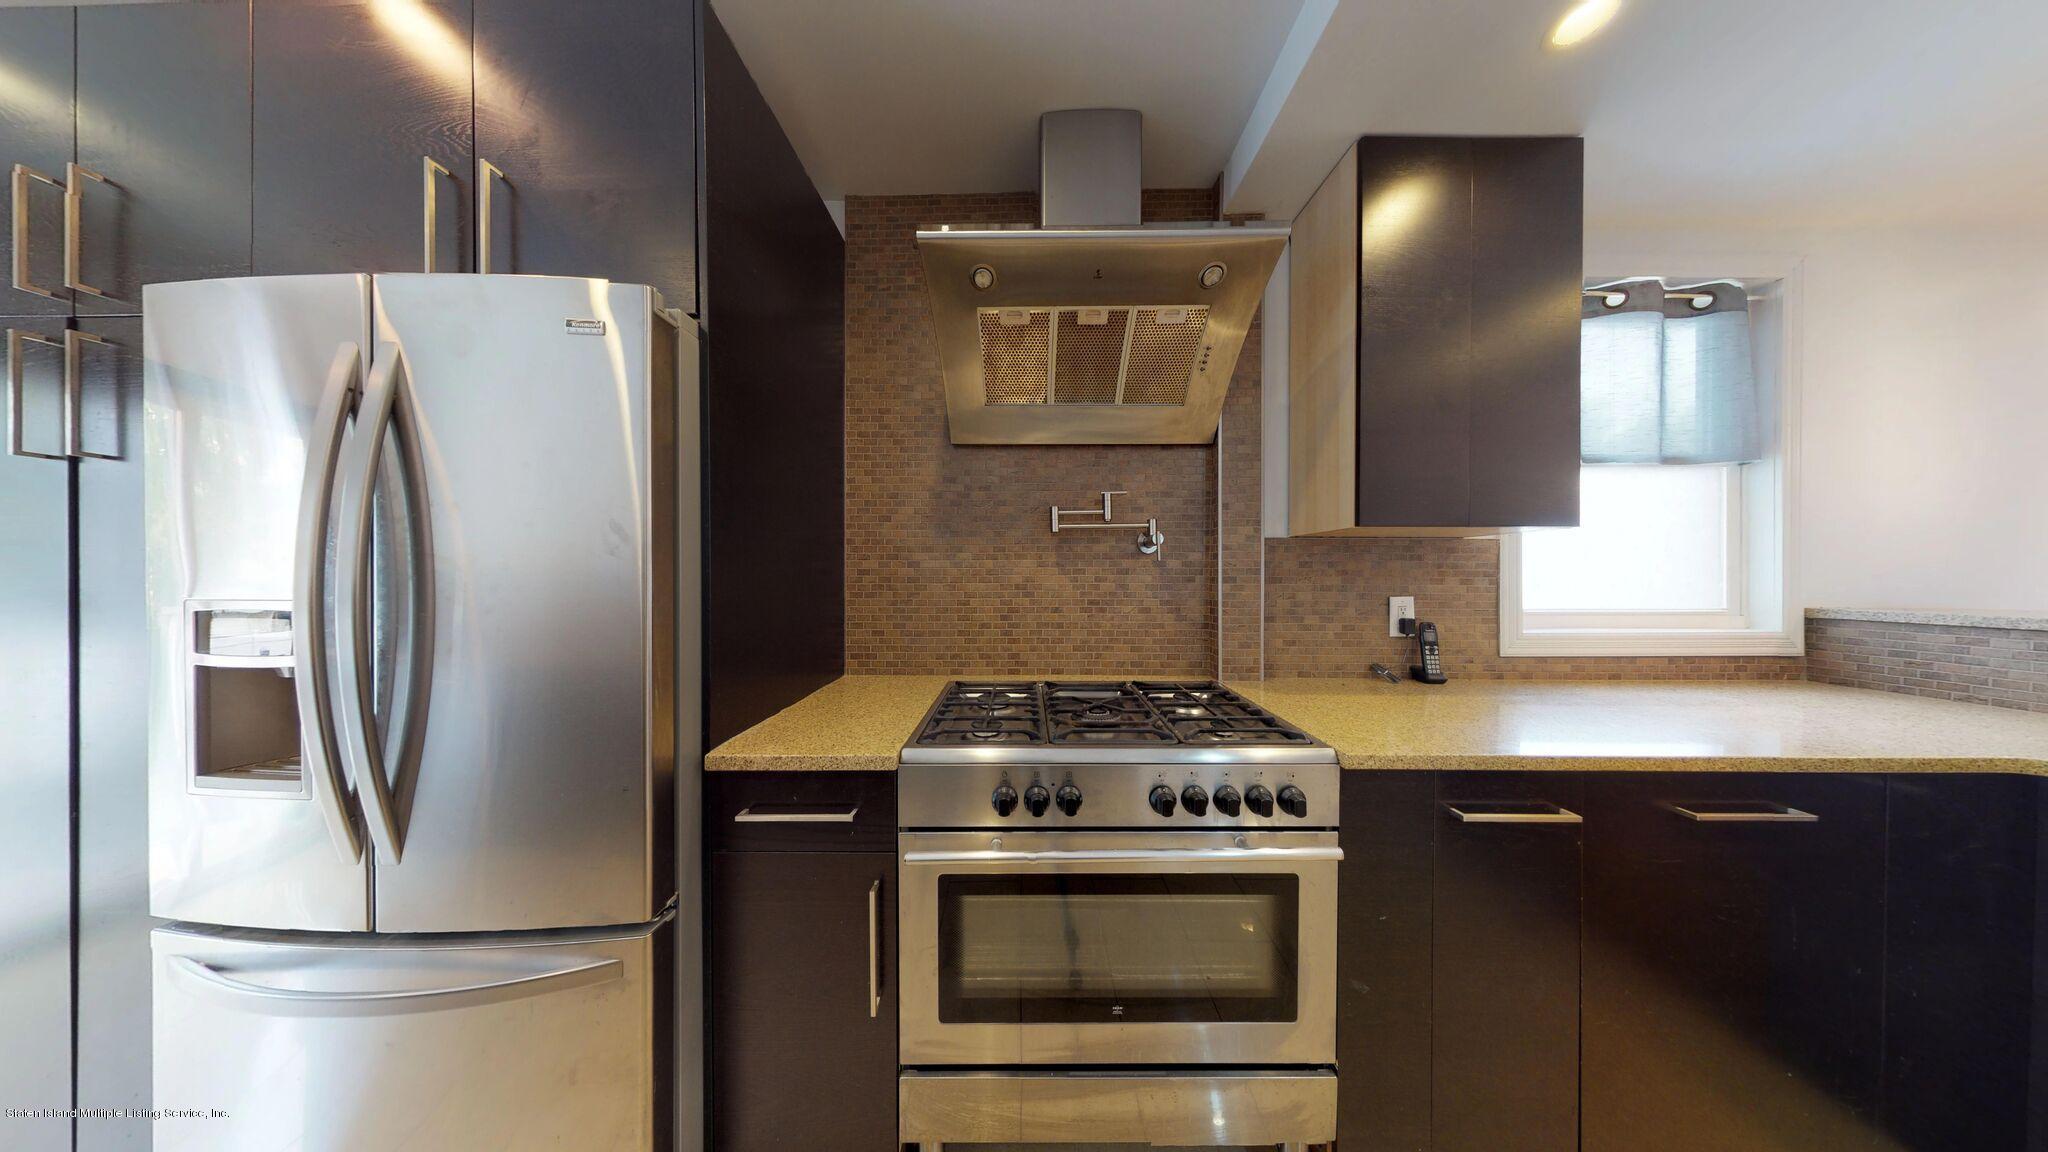 Single Family - Detached 128 Pelton Avenue  Staten Island, NY 10310, MLS-1124023-11